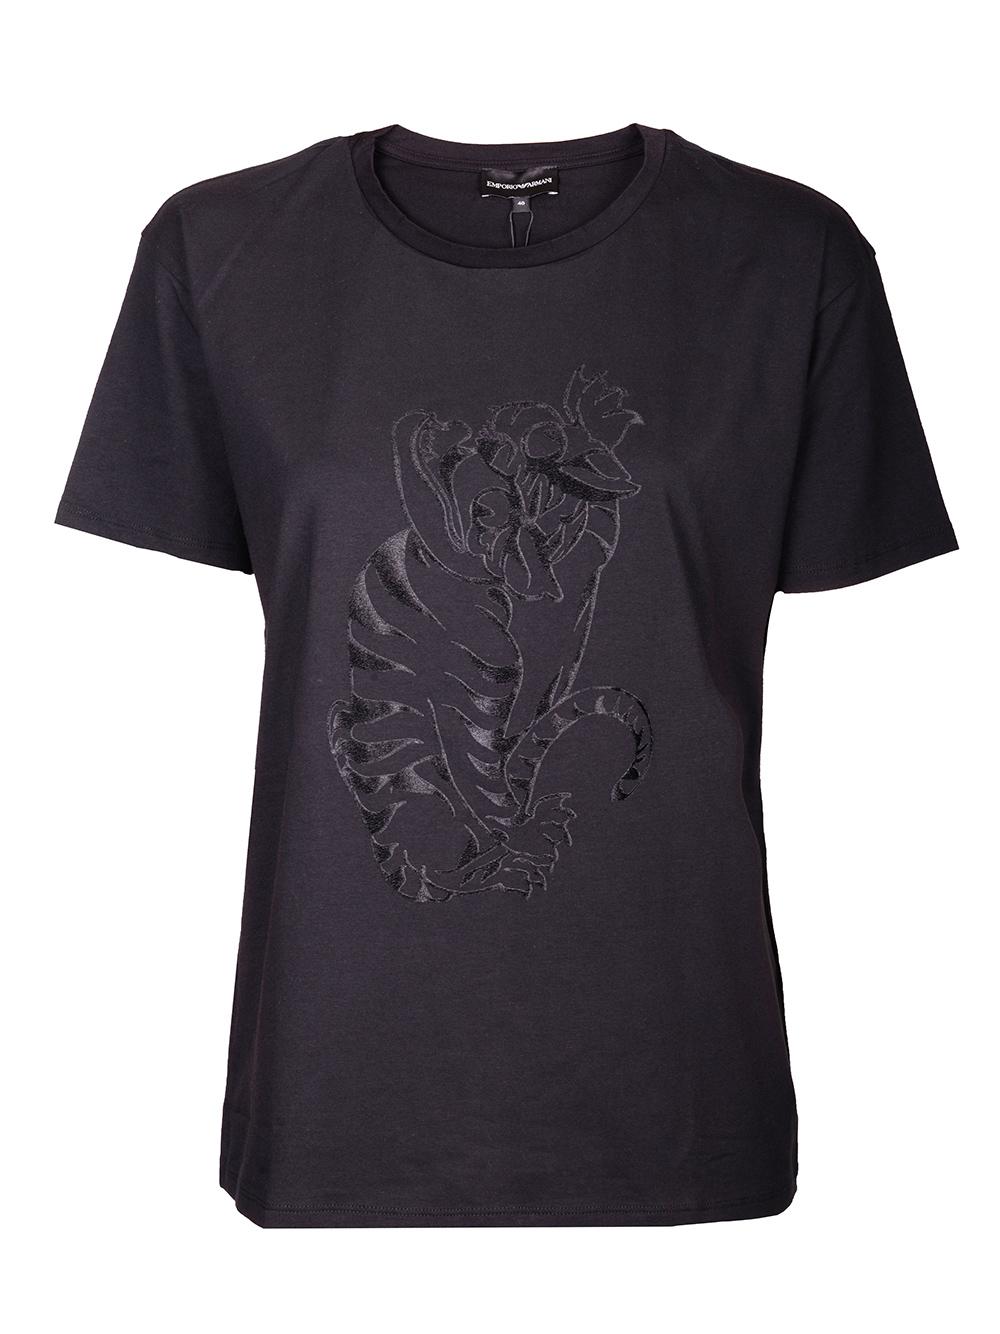 EMPORIO ARMANI Μπλούζα Τ-shirt 6G2T6E 2JQAZ ΜΑΥΡΟ